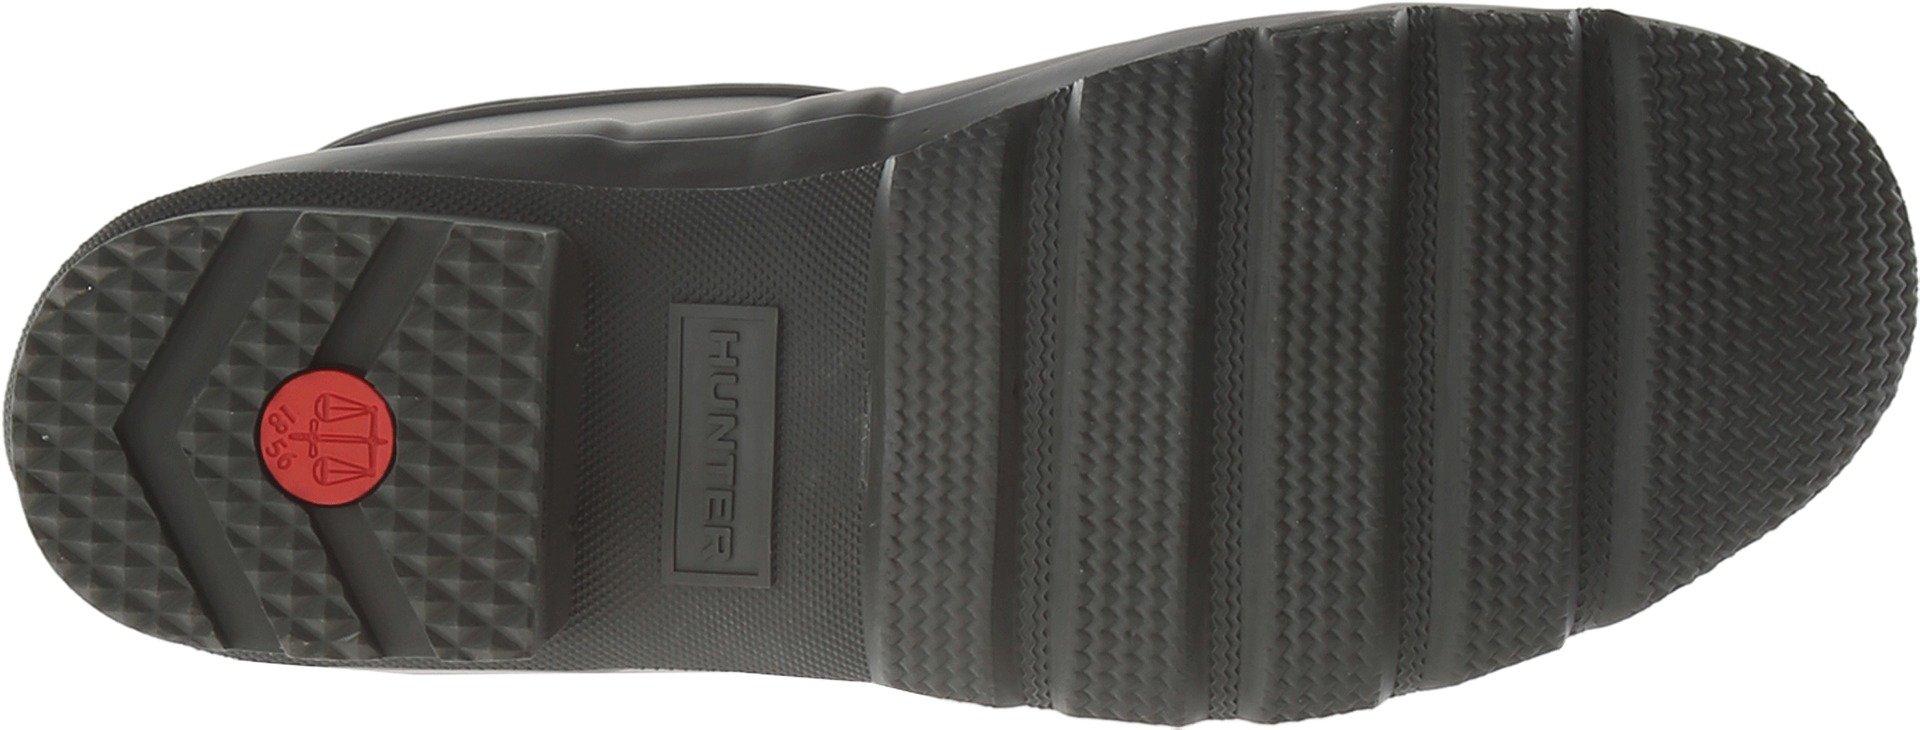 Hunter Men's Original Short Rain Boots Dark Olive 9 M US